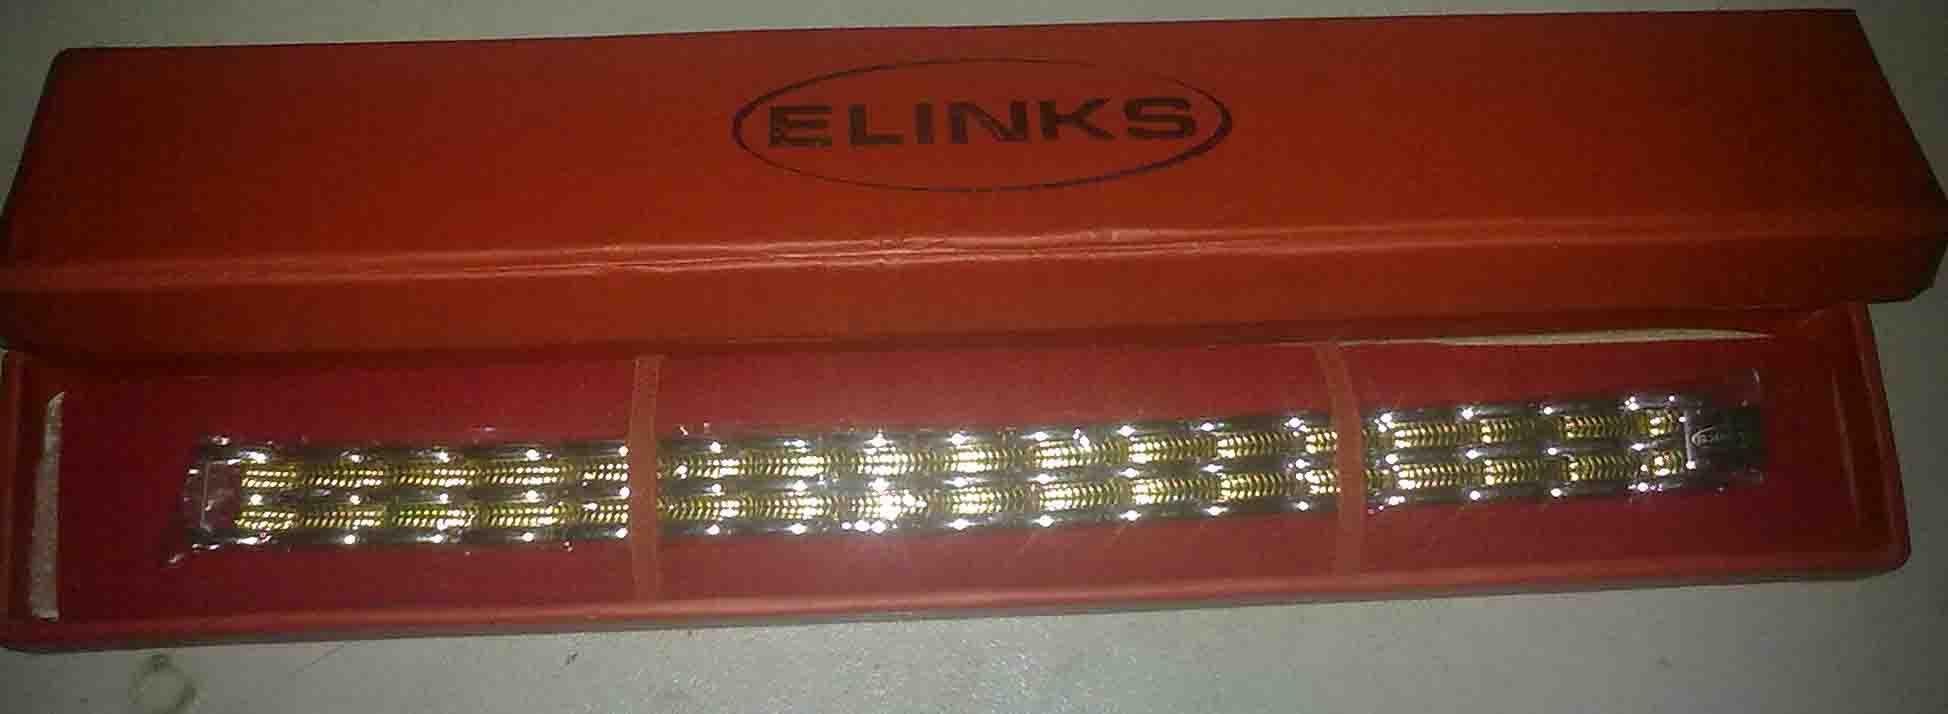 tiens energy bracelet cost